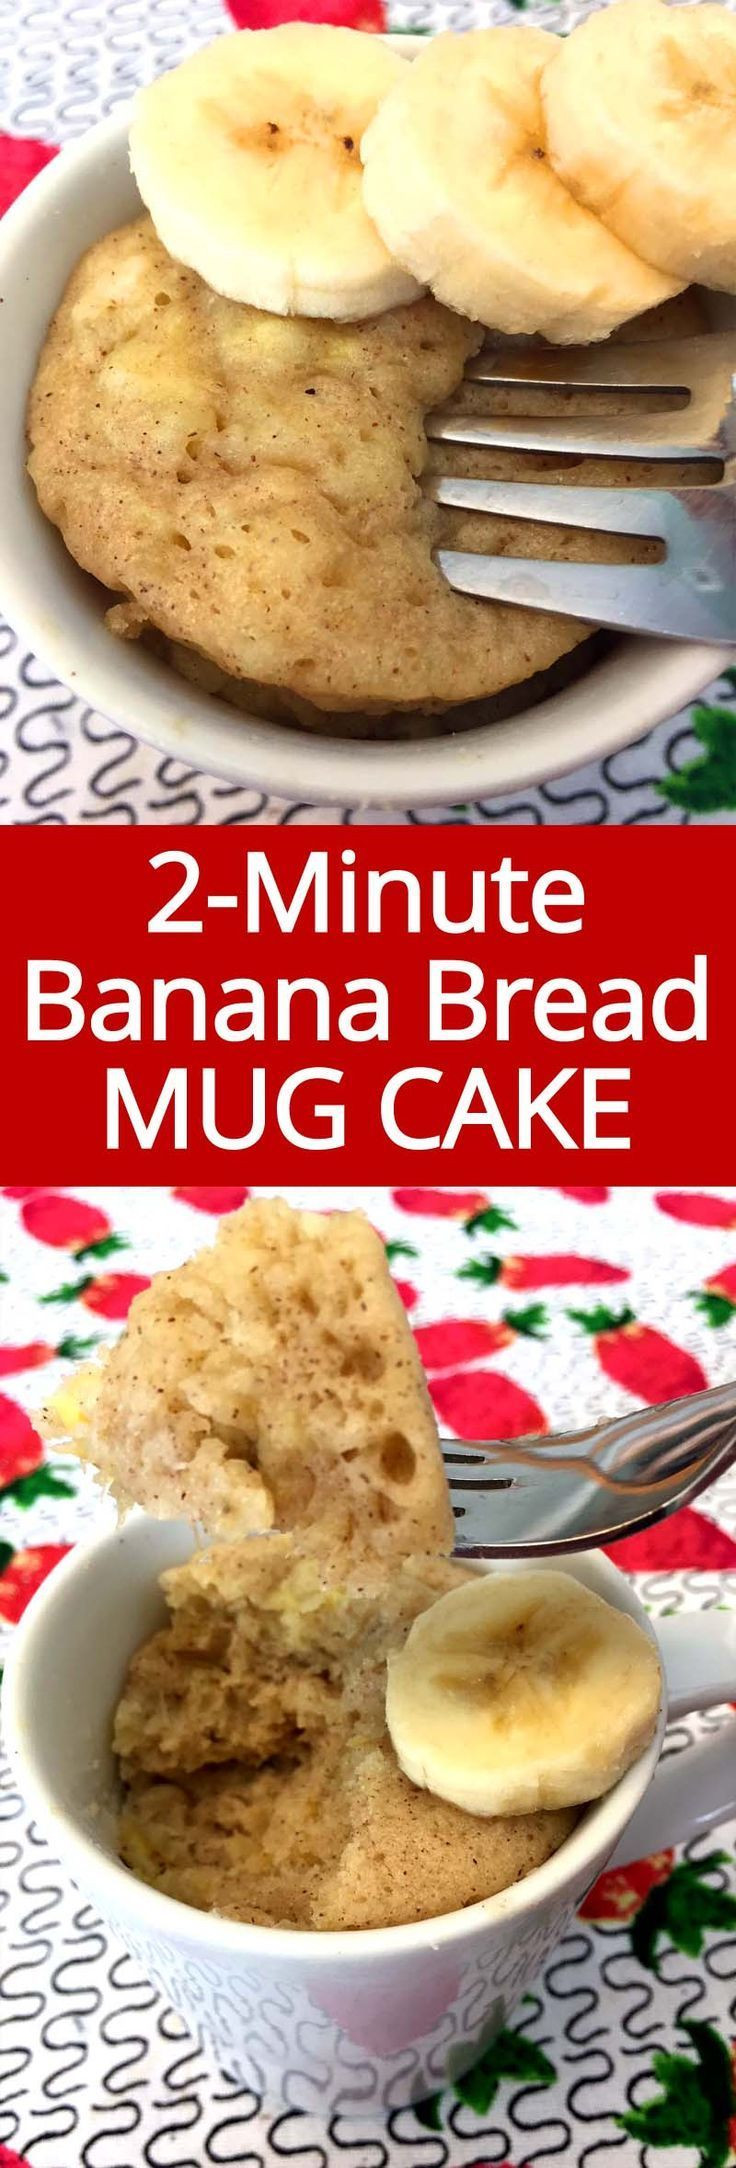 Keto Banana Bread Mug Cake  Gluten Free Banana Bread Mug Cake